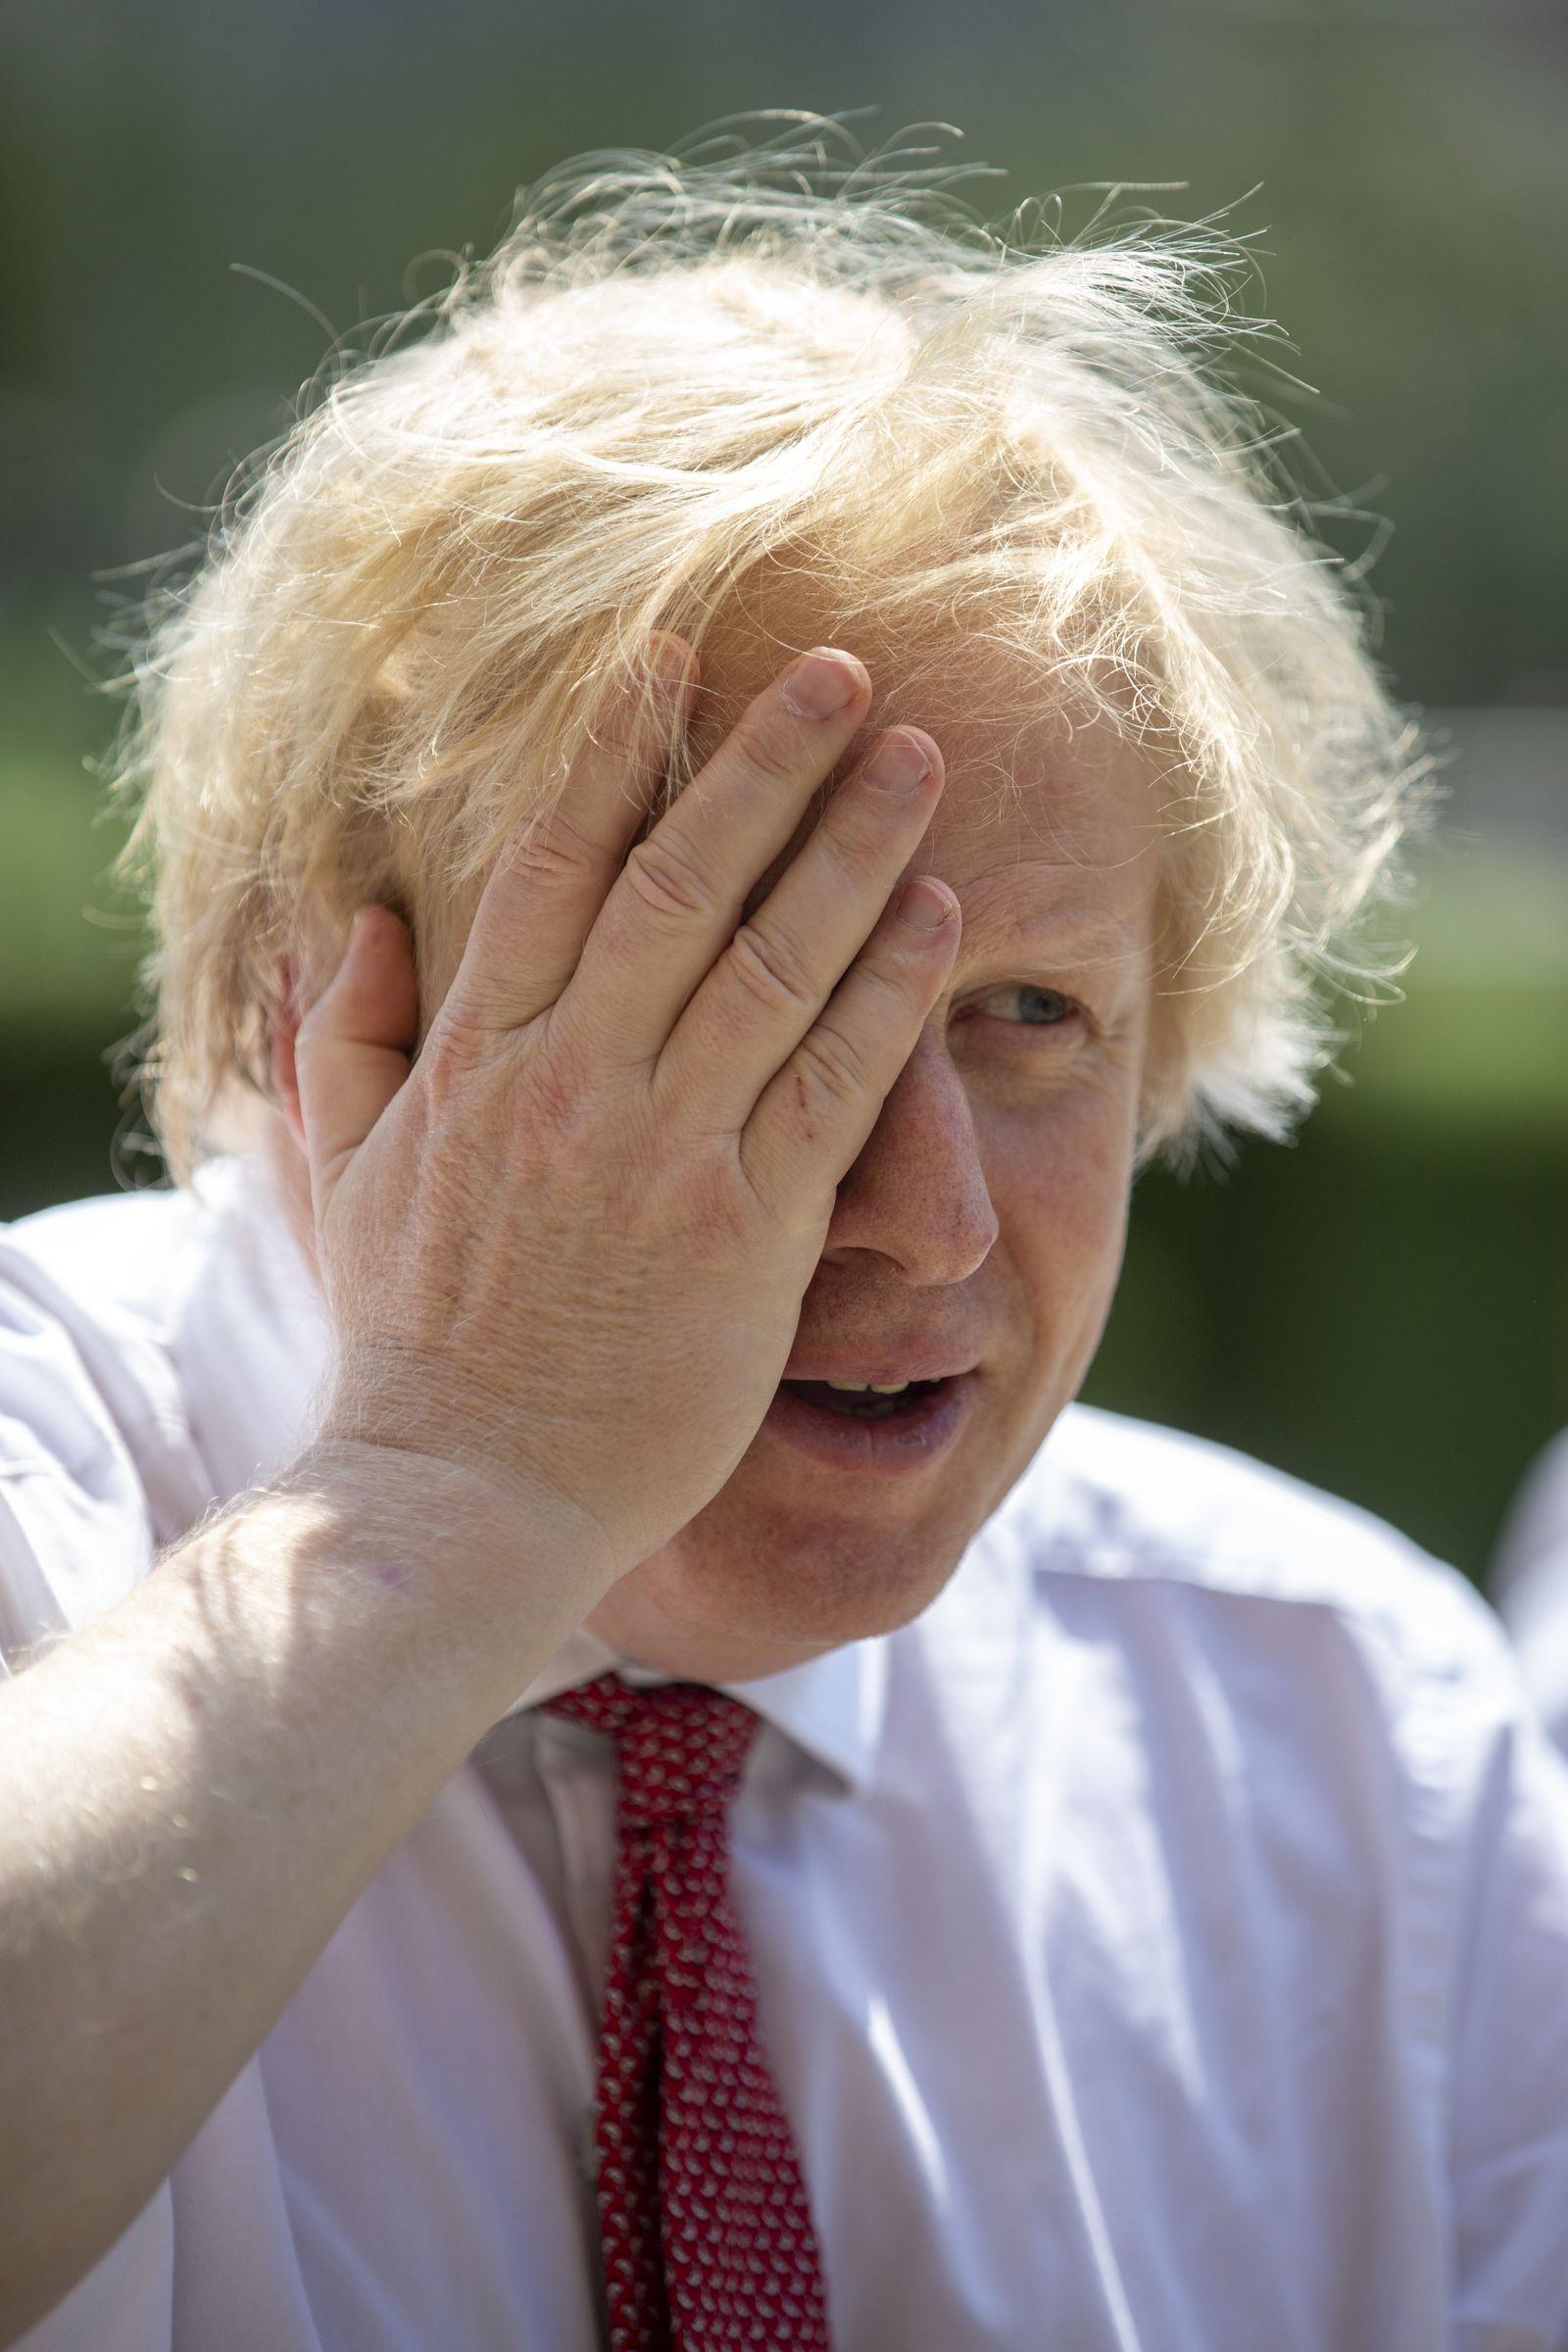 *** BESTPIX *** The UK Prime Minister And Chancellor Visit An East London Restaurant Preparing To Open Post Coronavirus Lockdown